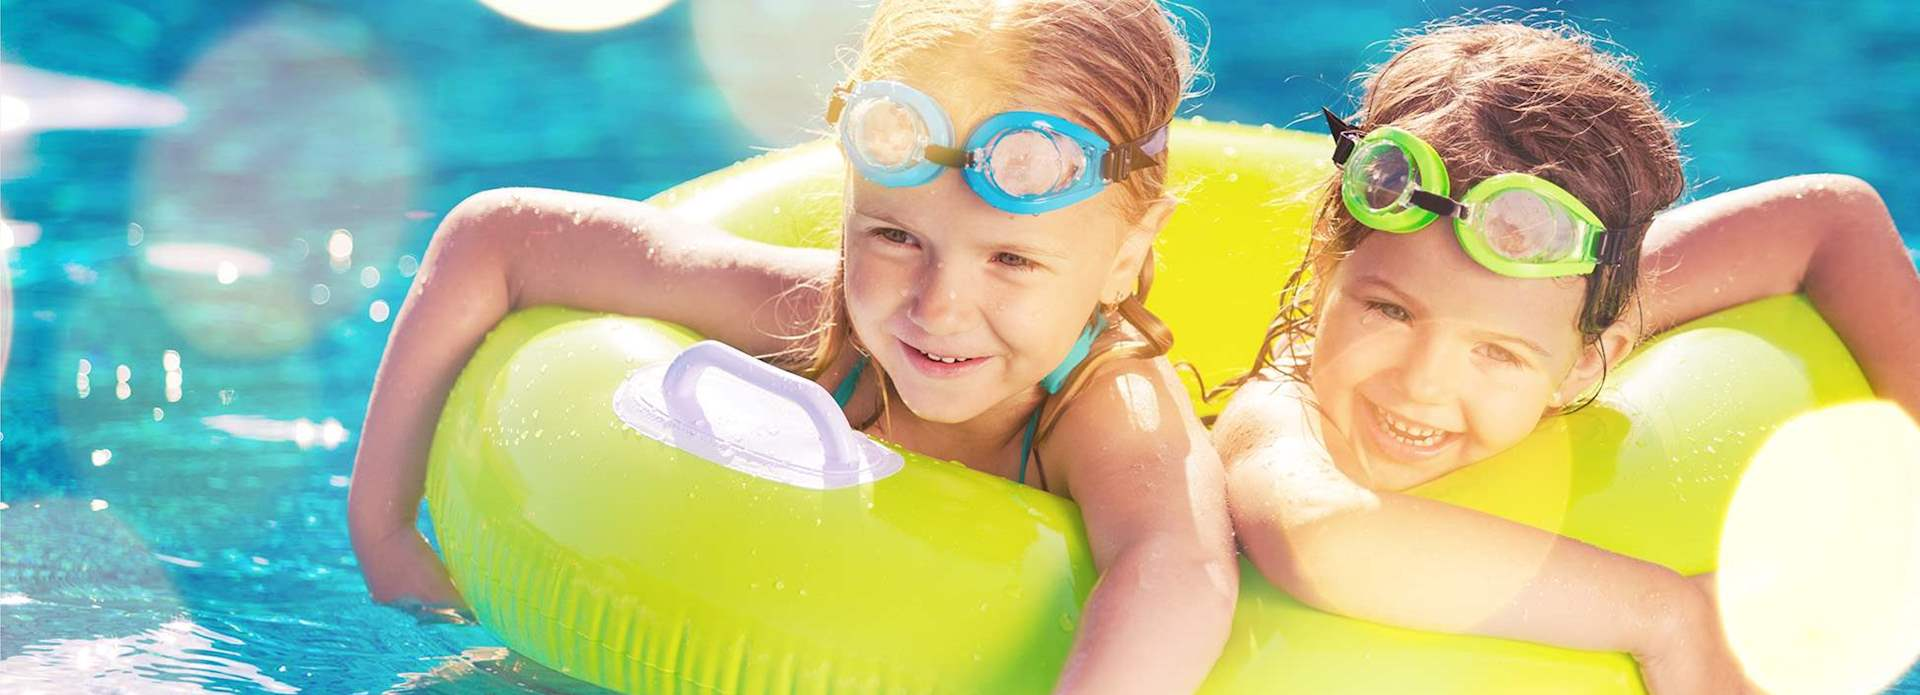 Kids Enjoy in Swimmingpool in Orlando, Florida Resort